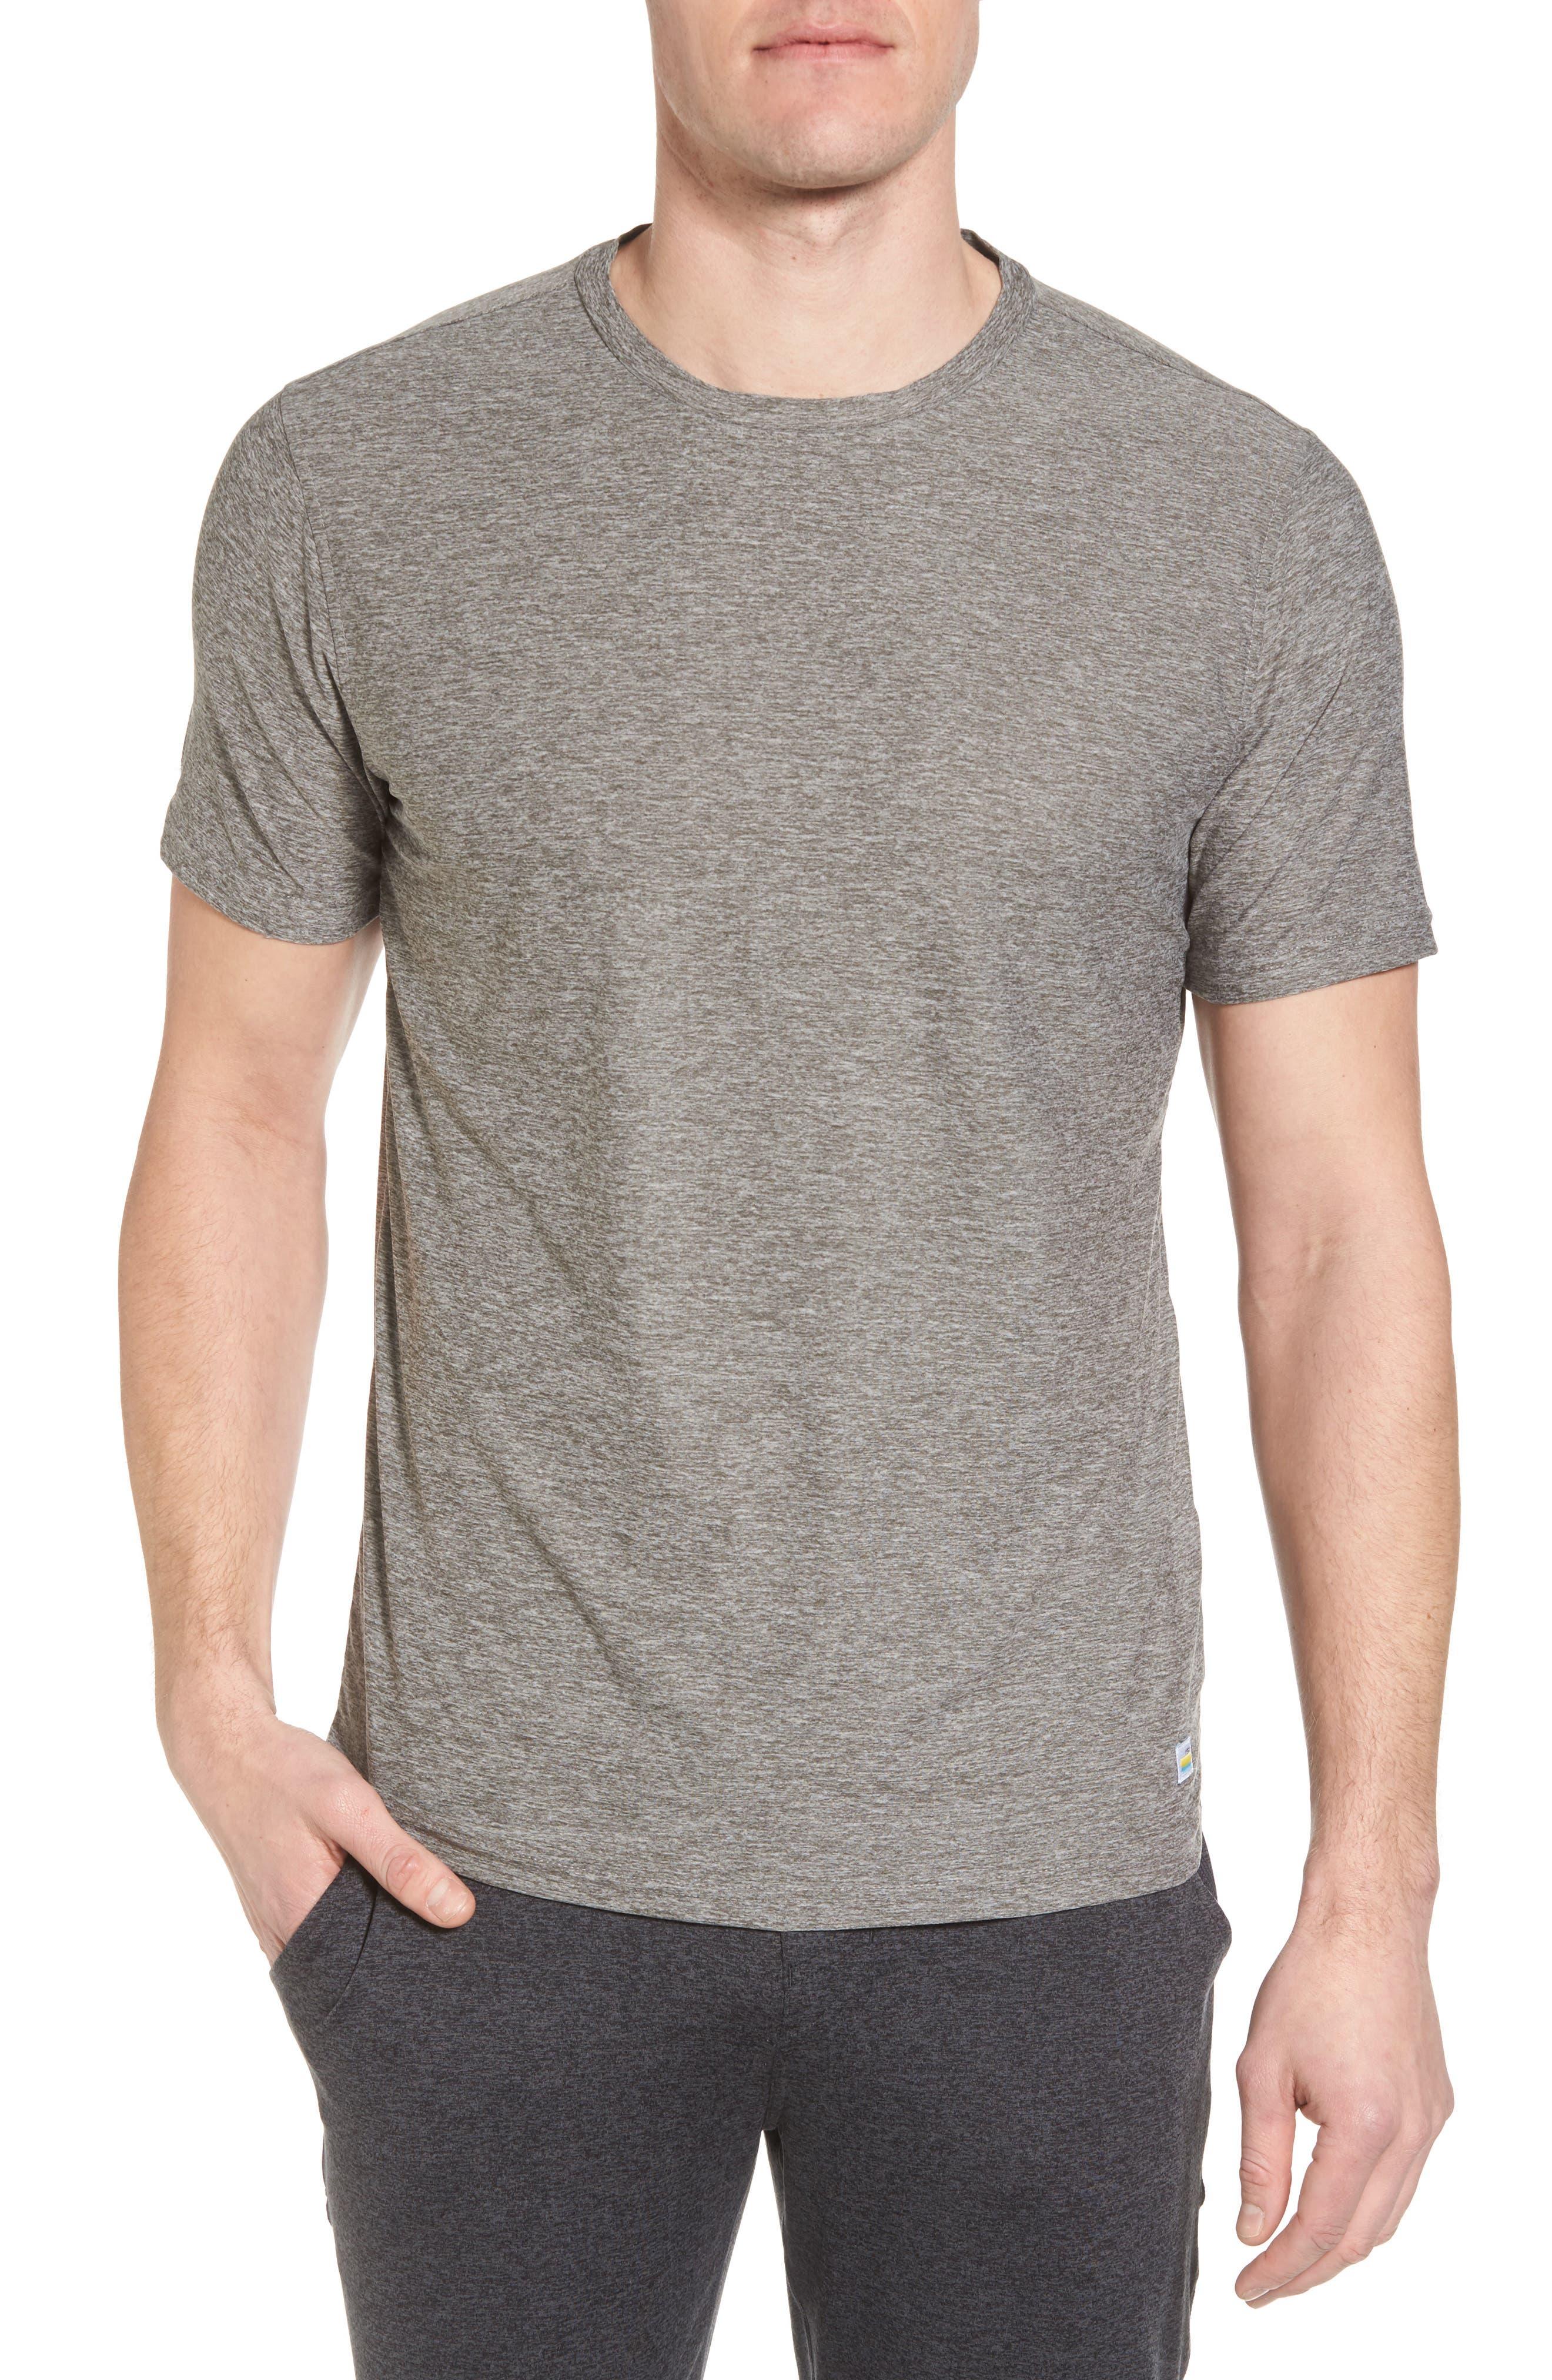 Vuori Strato Slim Fit Crewneck T-Shirt, Grey